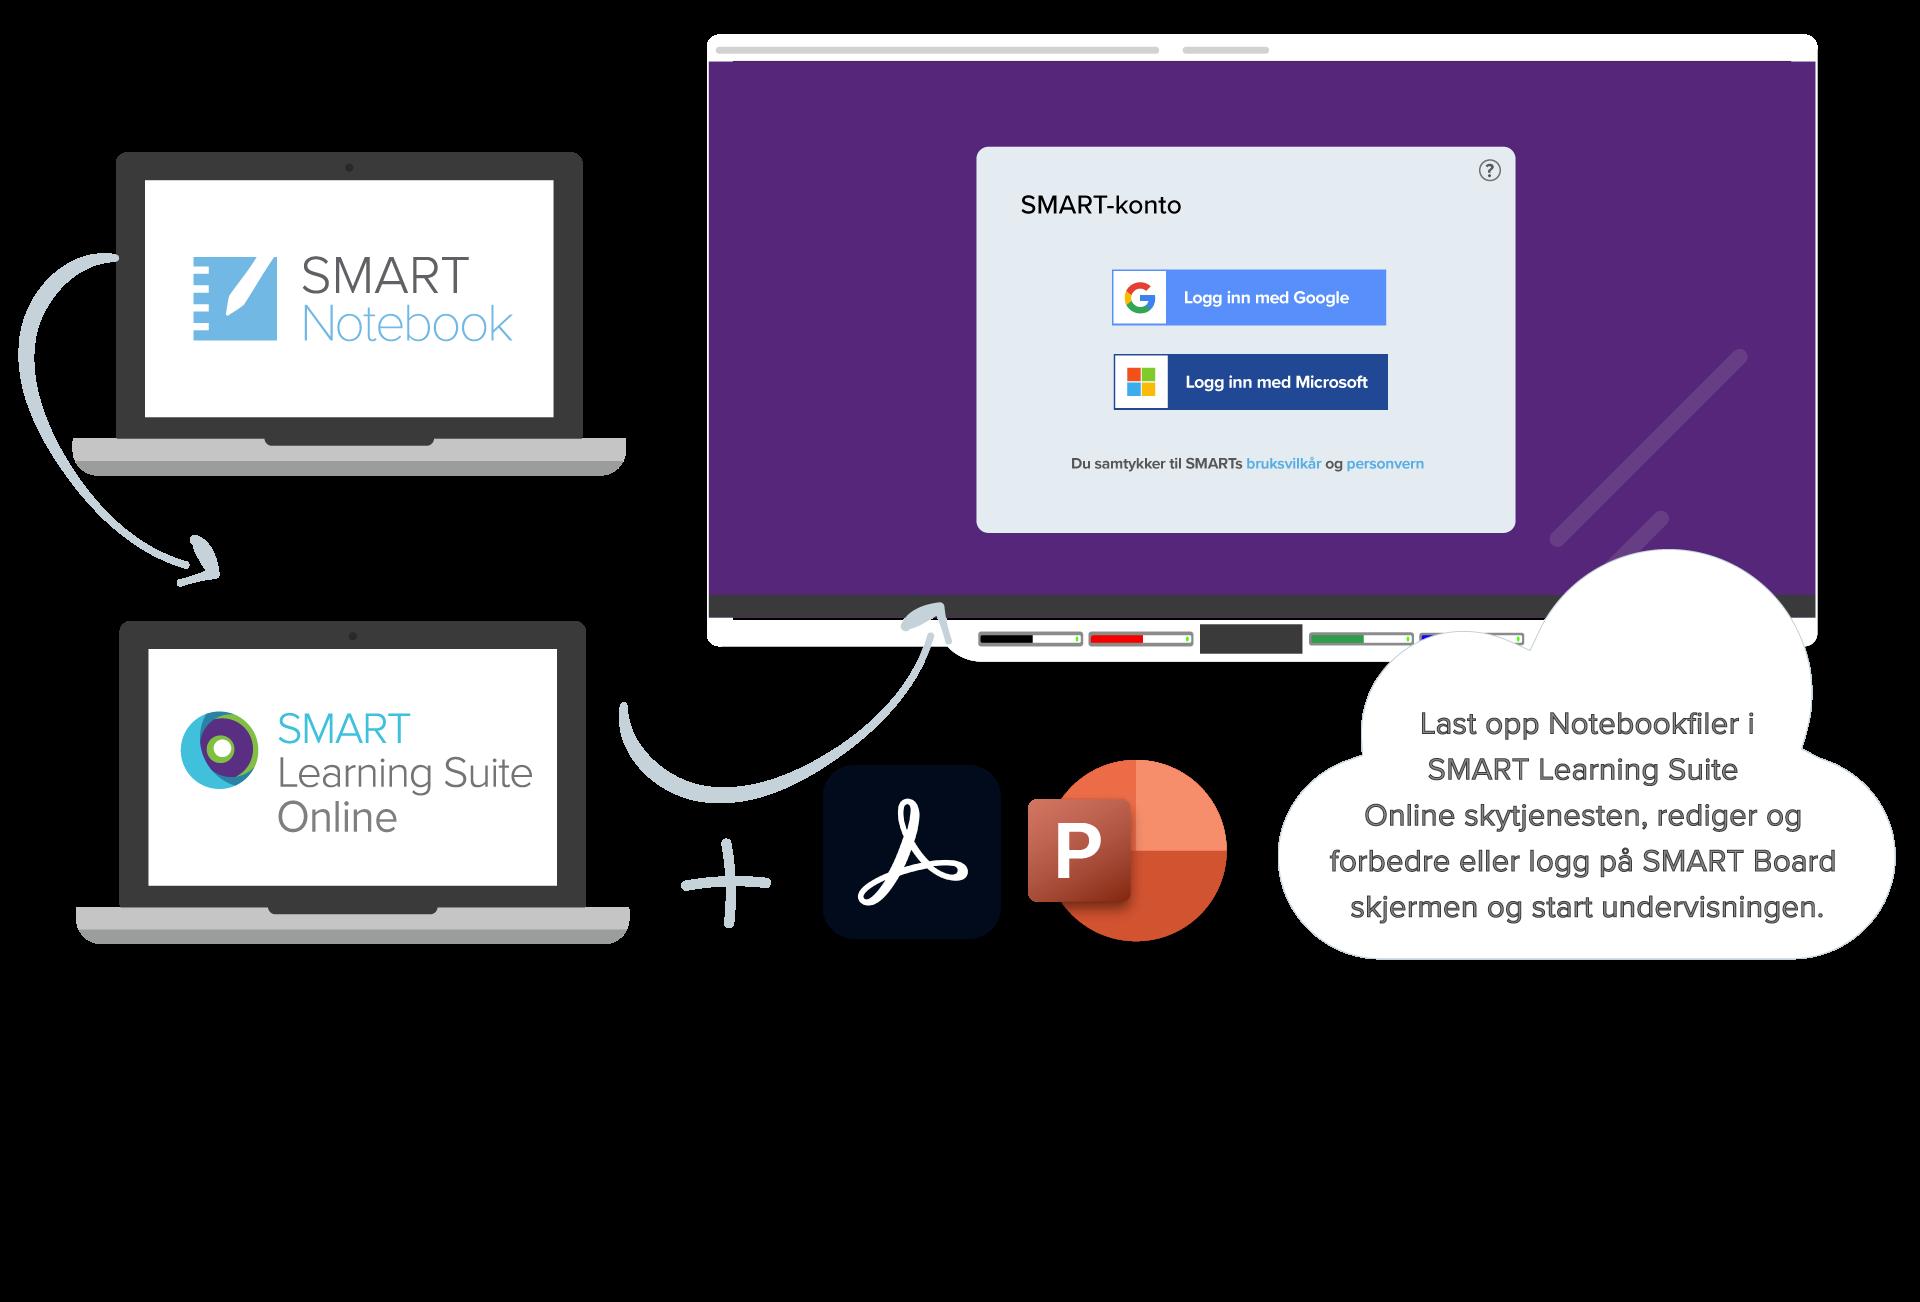 SMART_Learning_Suite_konto